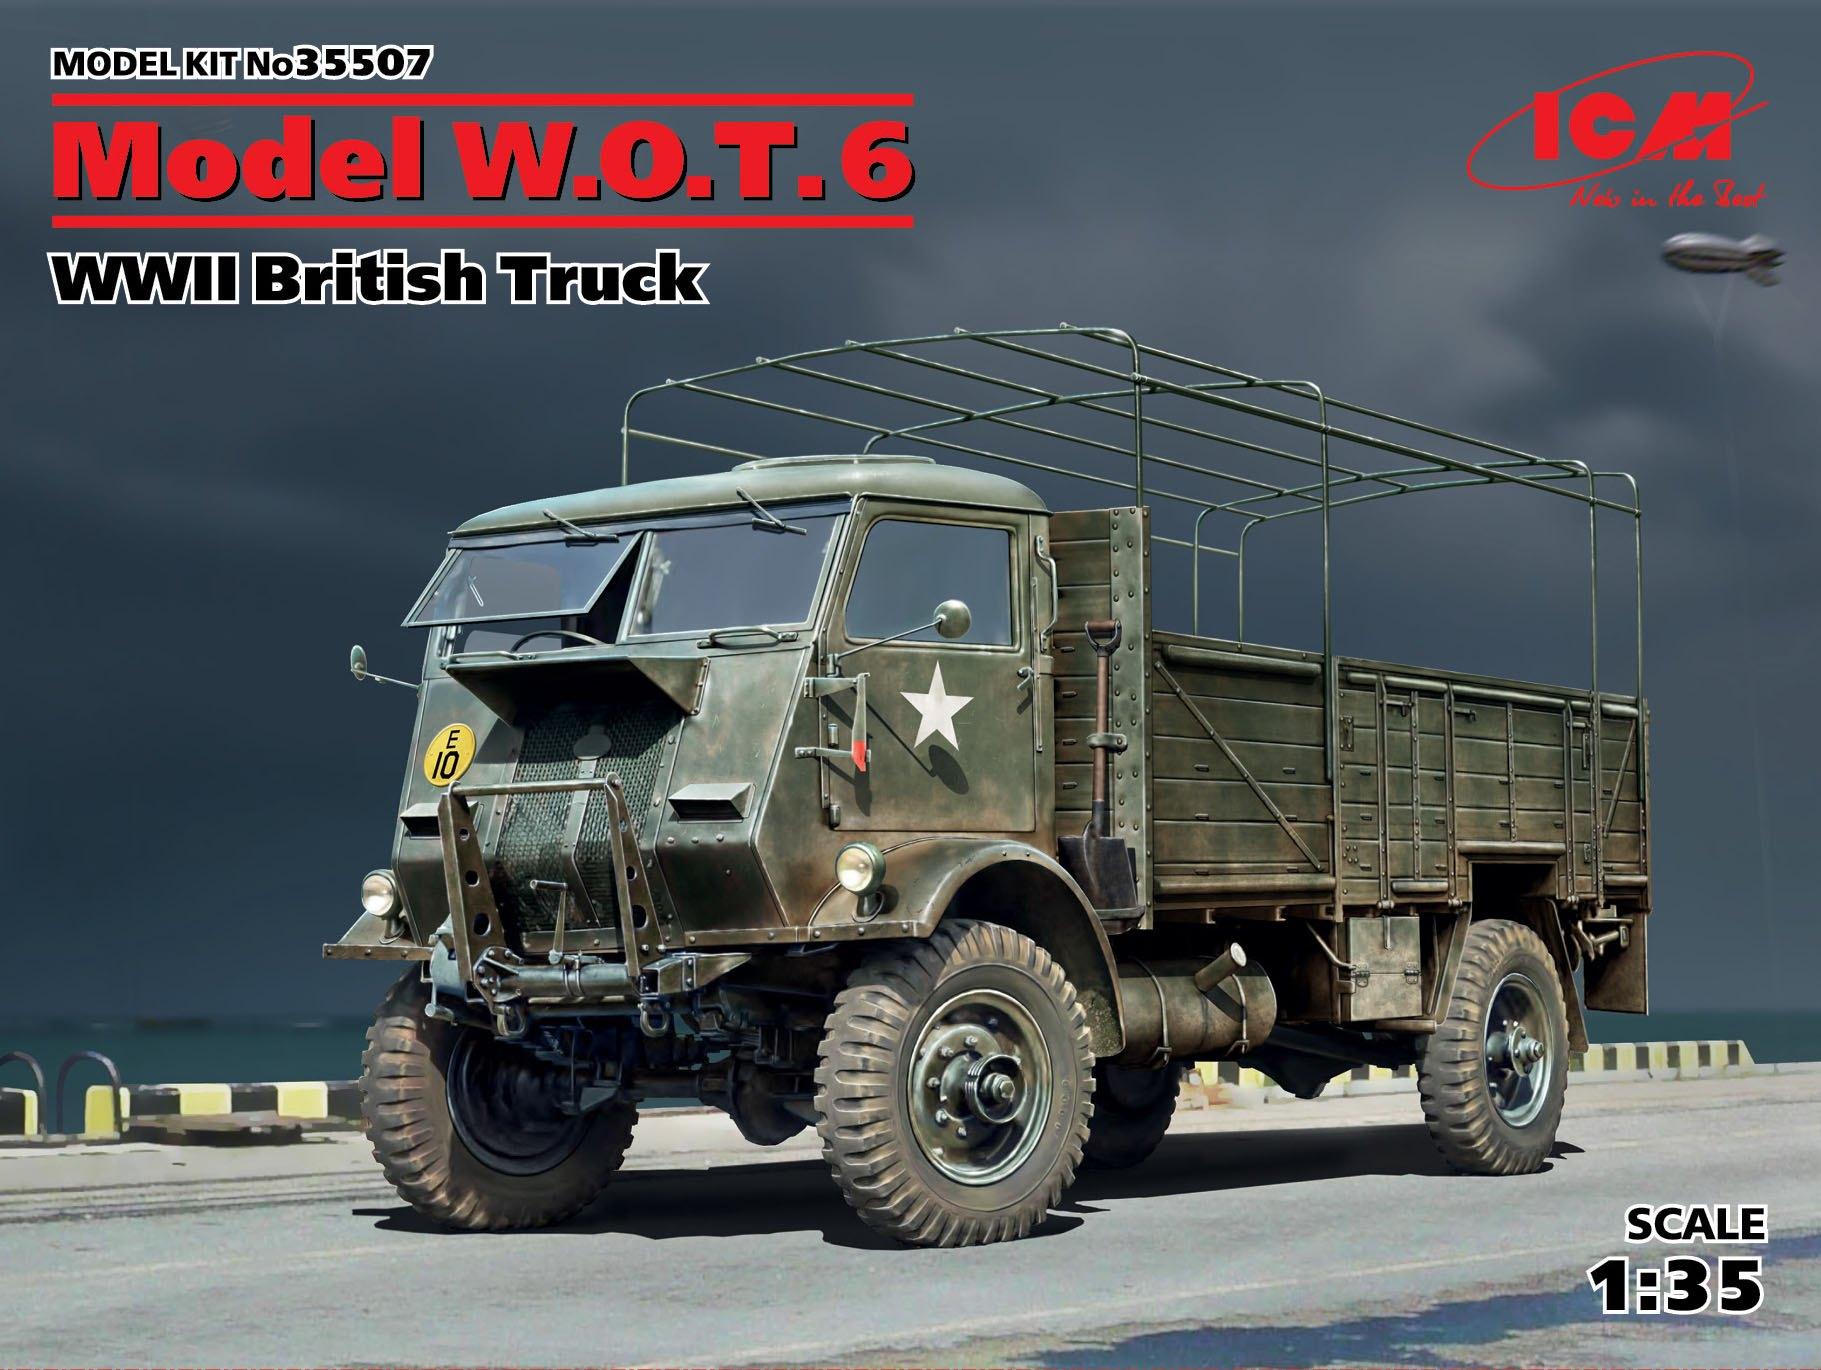 ICM 1:35 W.O.T. 6  WWII British Truck